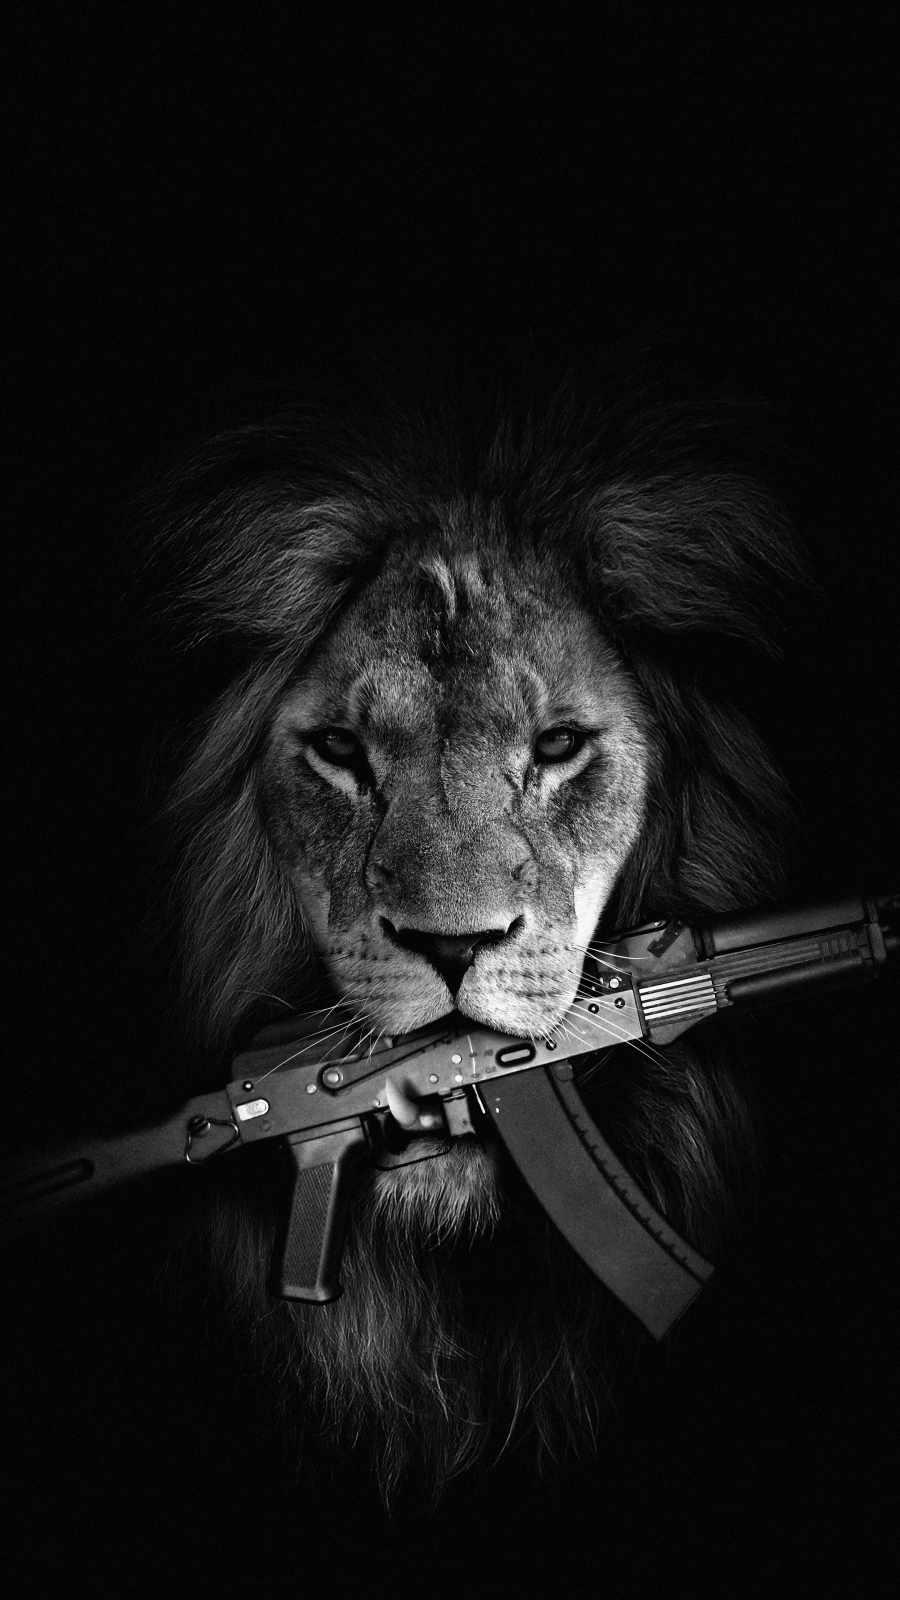 Lion with Gun iPhone Wallpaper